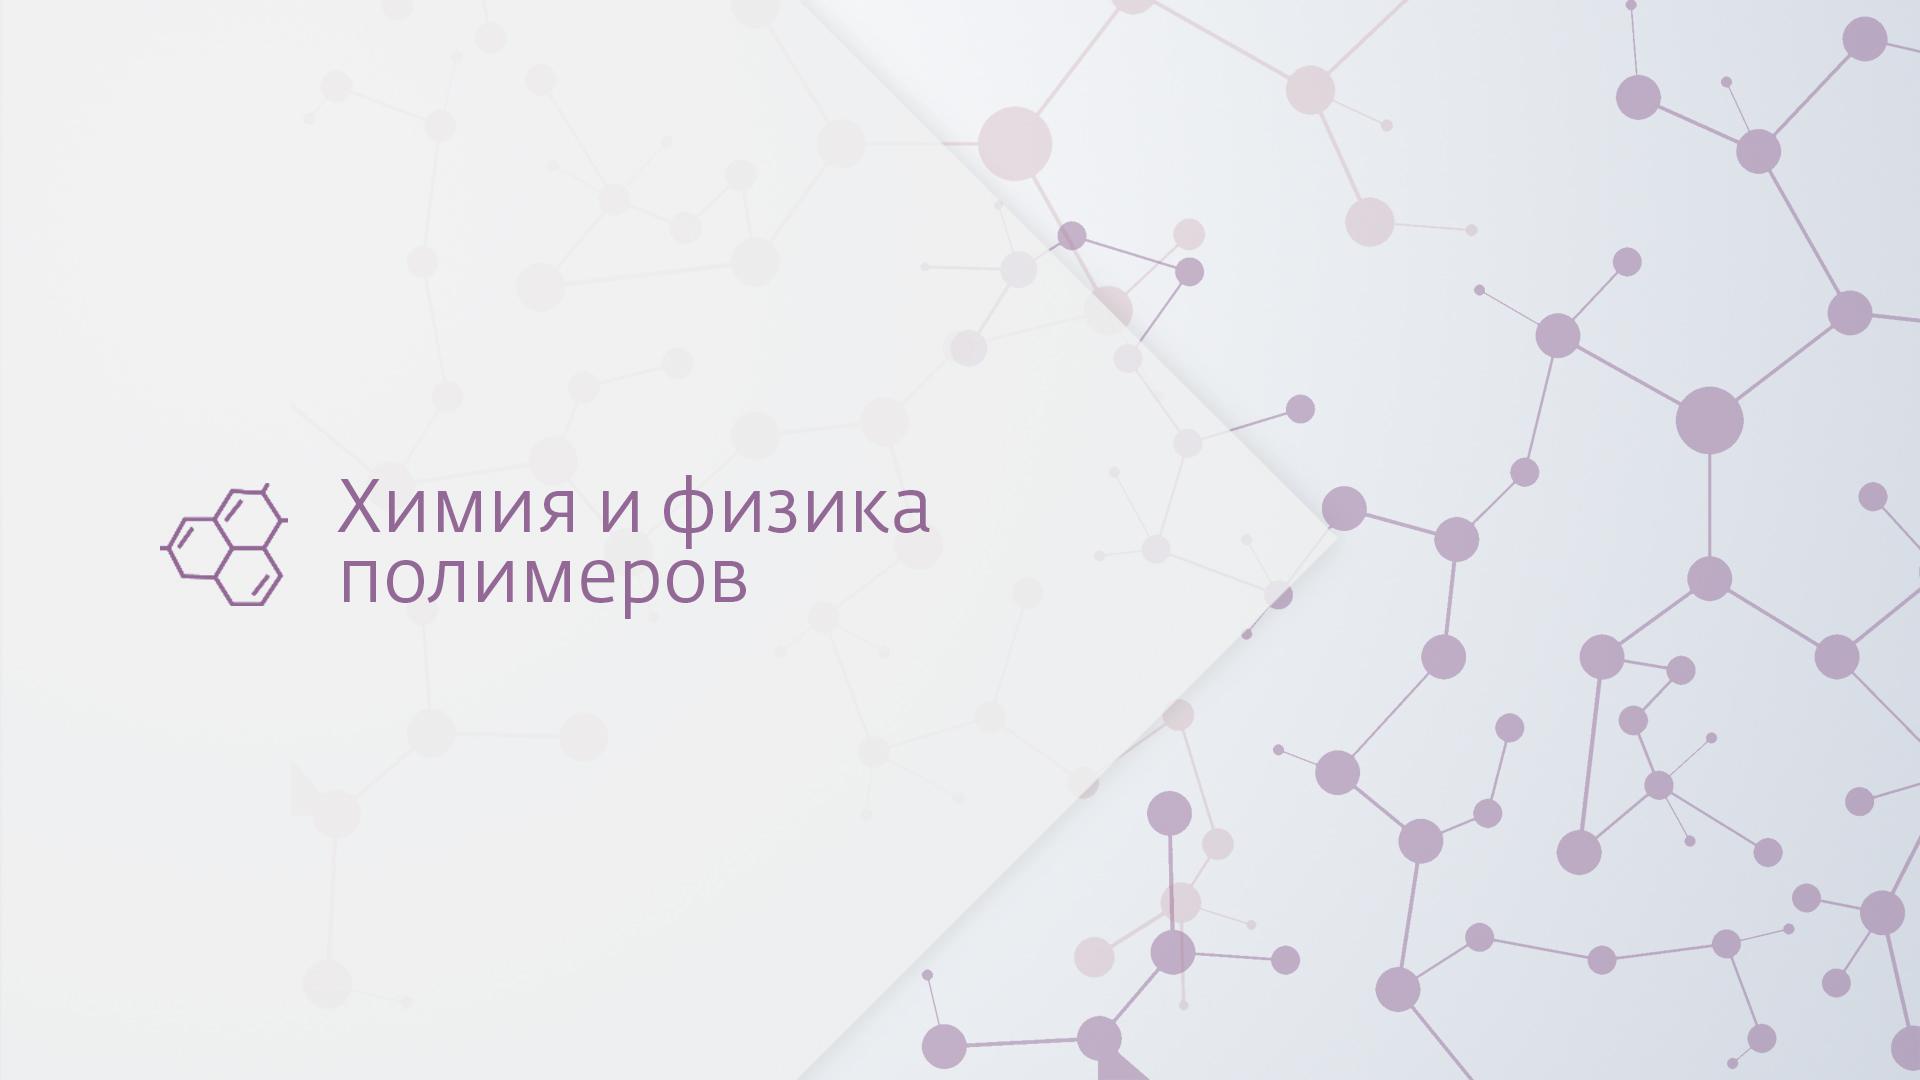 Course Image Химия и физика полимеров